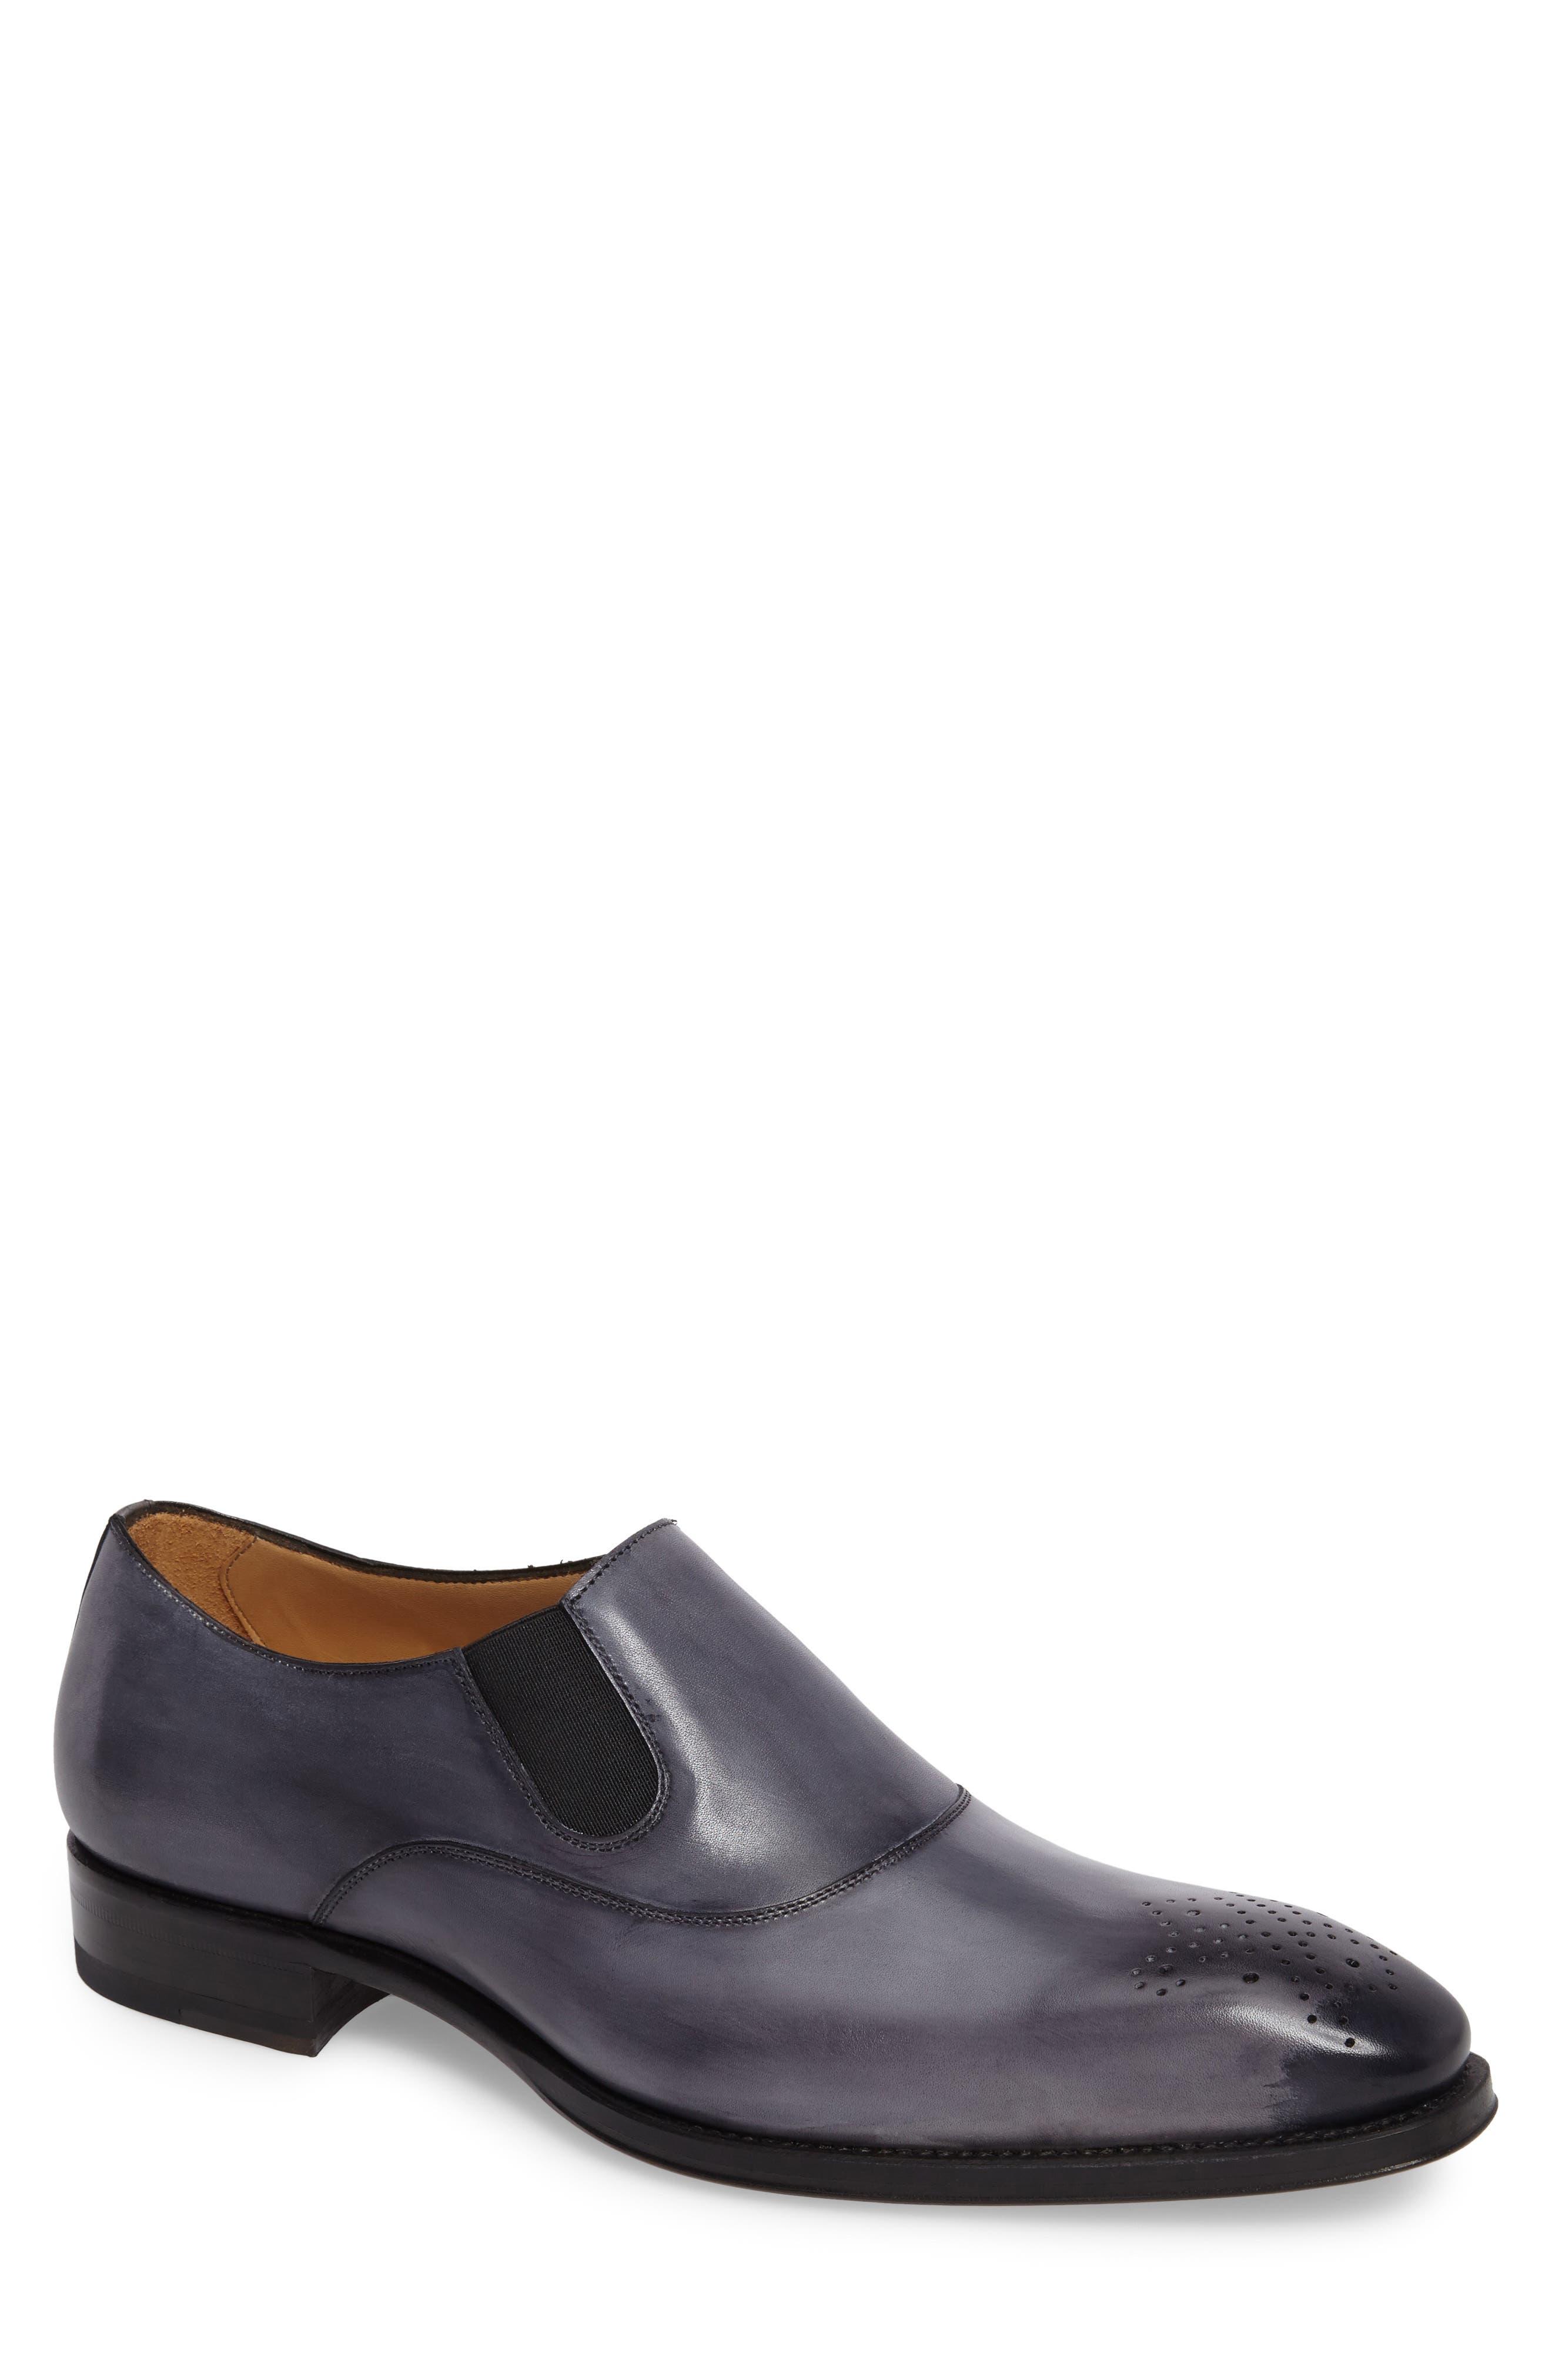 Posadas Venetian Loafer,                         Main,                         color, 020